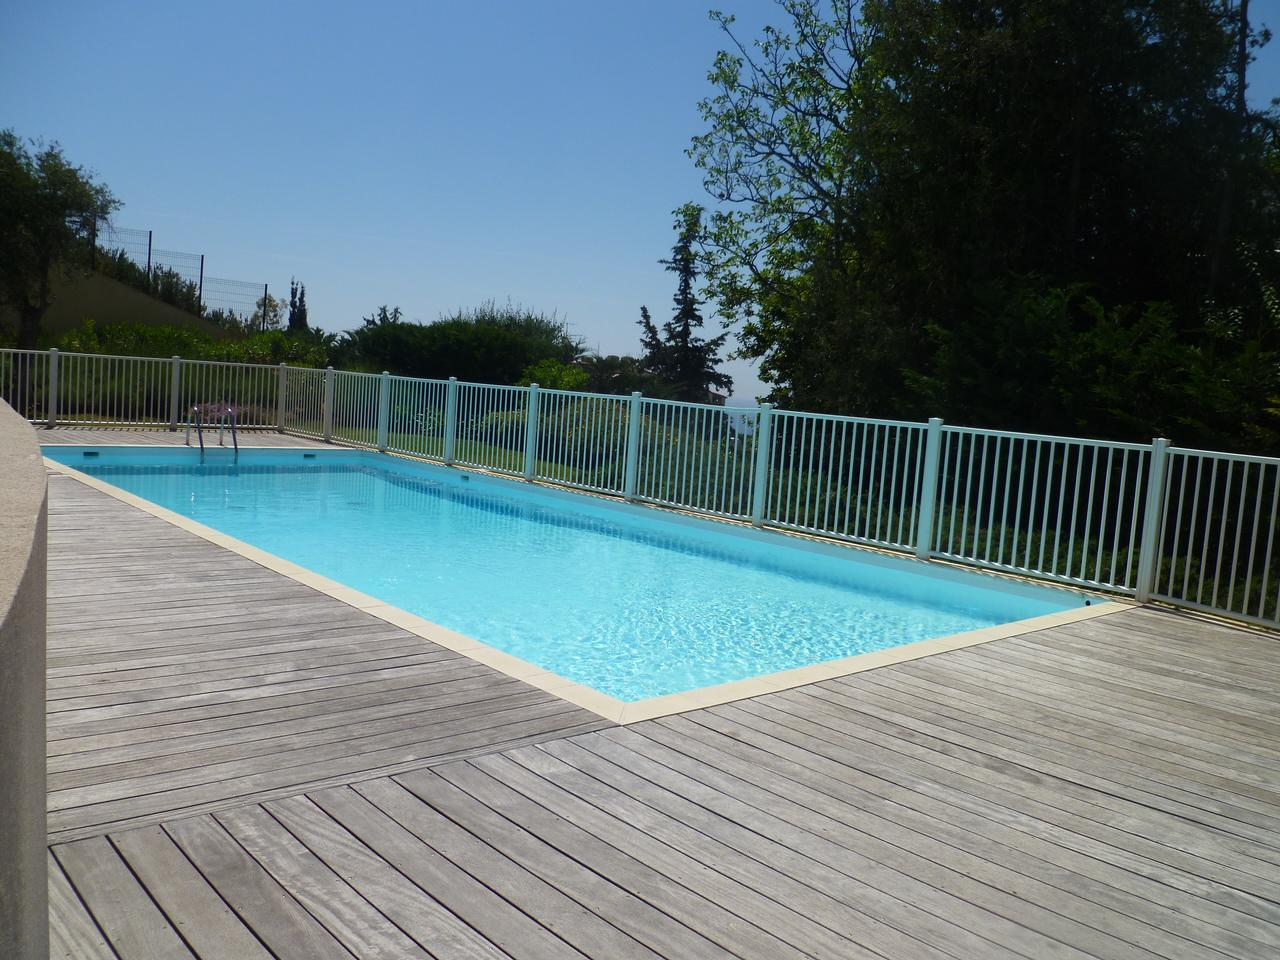 Immobilier nice vue mer appartement nice 4 pieces vue mer avec piscine et terrasse a vendre for Piscine vendeur